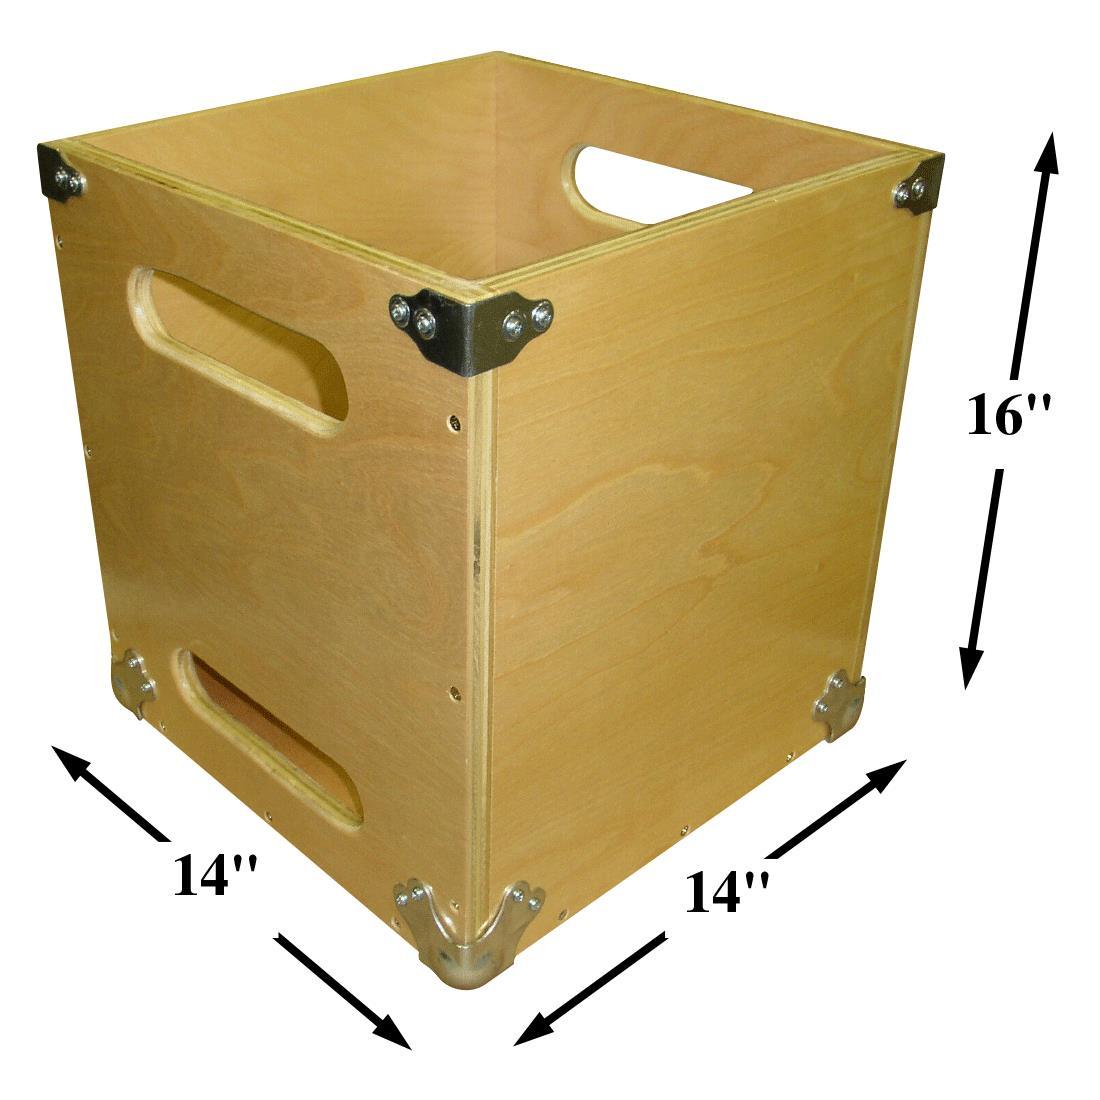 Bailey Heavy Duty Lift Box  Exercise Devices-2101